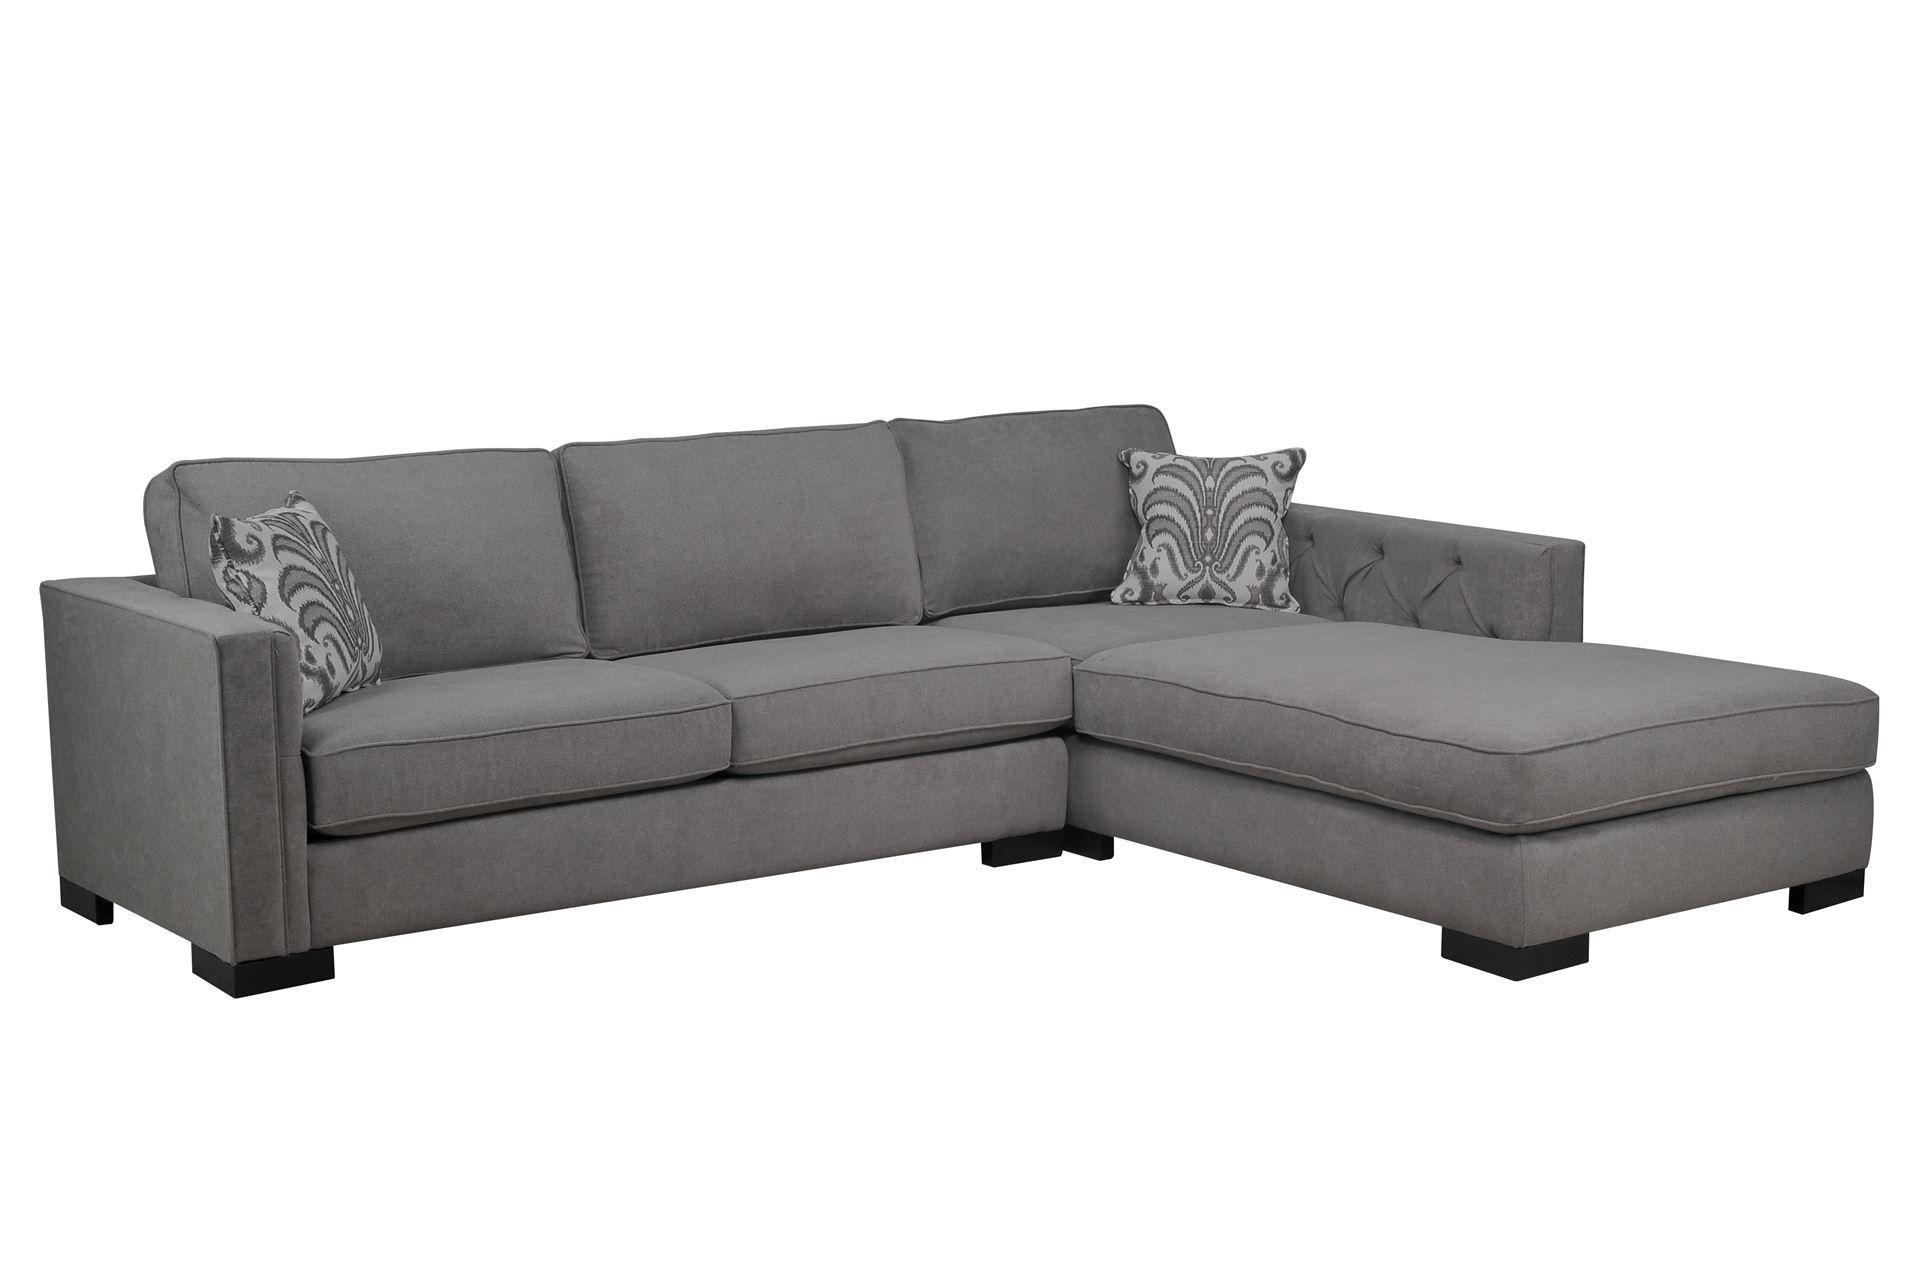 Julius 2 Piece Sofa/Chaise | Chaise Sofa, Dinning Room Decor, Living Spaces